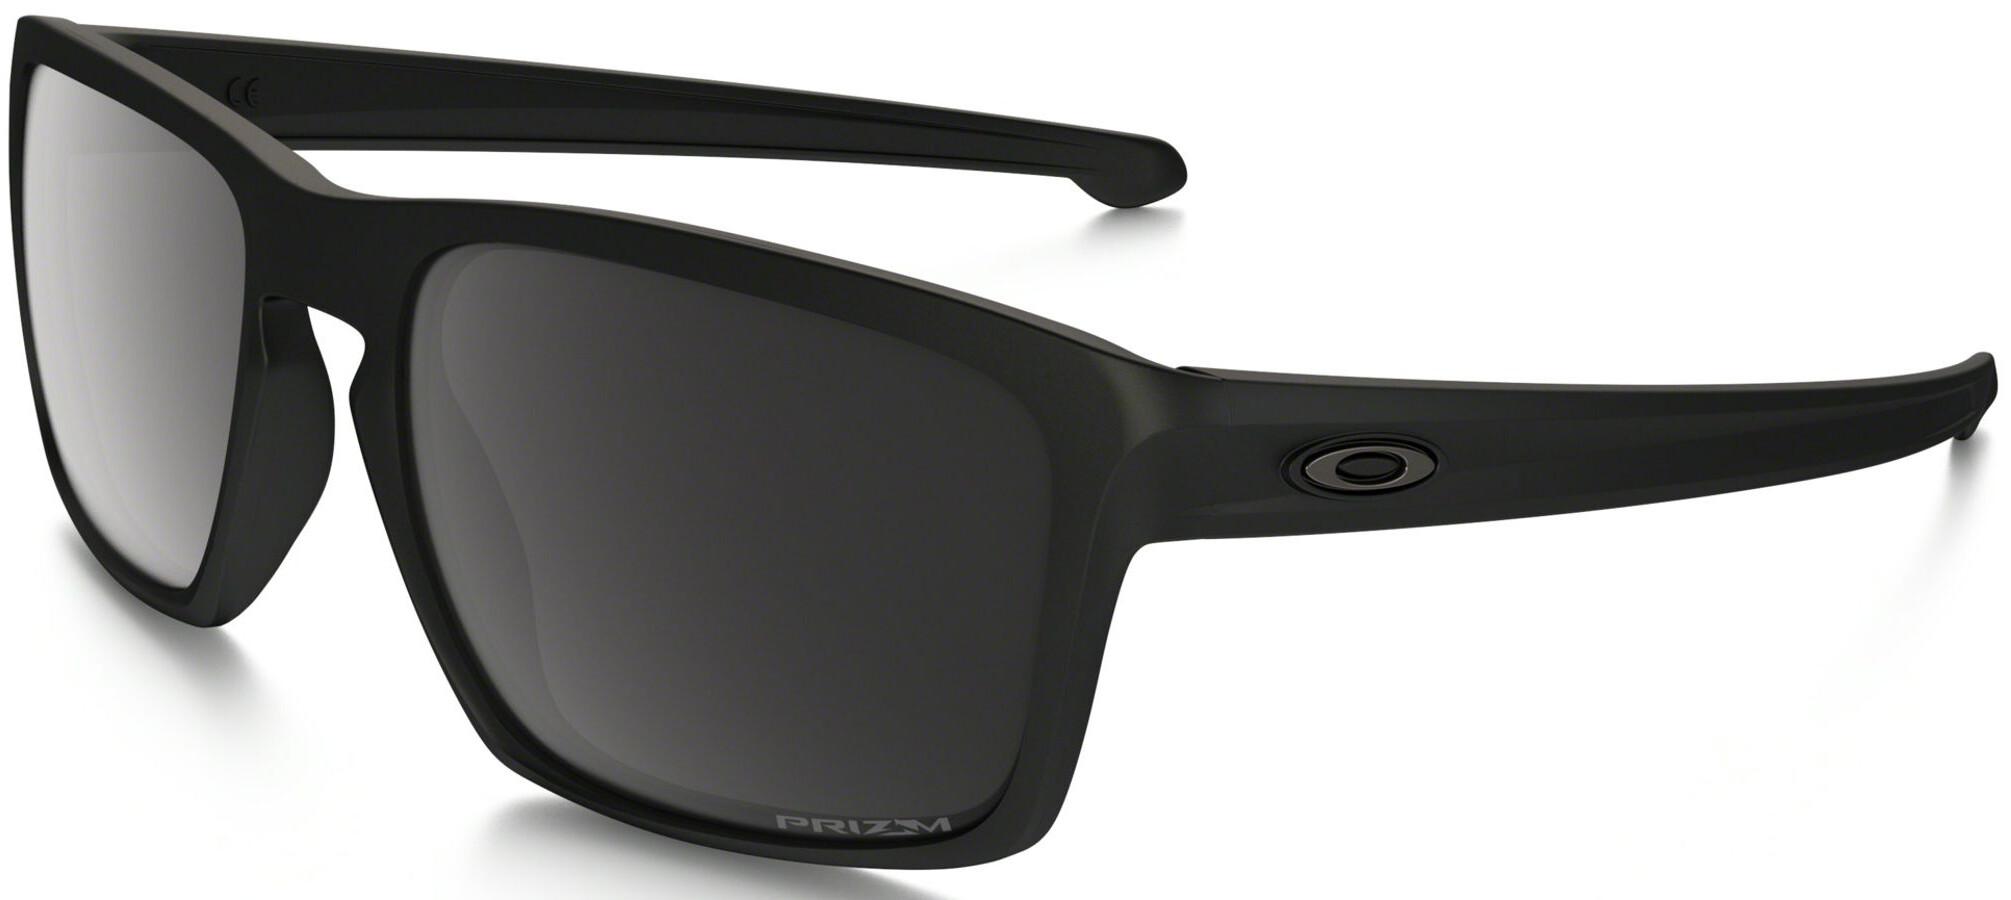 aa8c02cb12f6c Oakley Sliver - Gafas ciclismo - negro